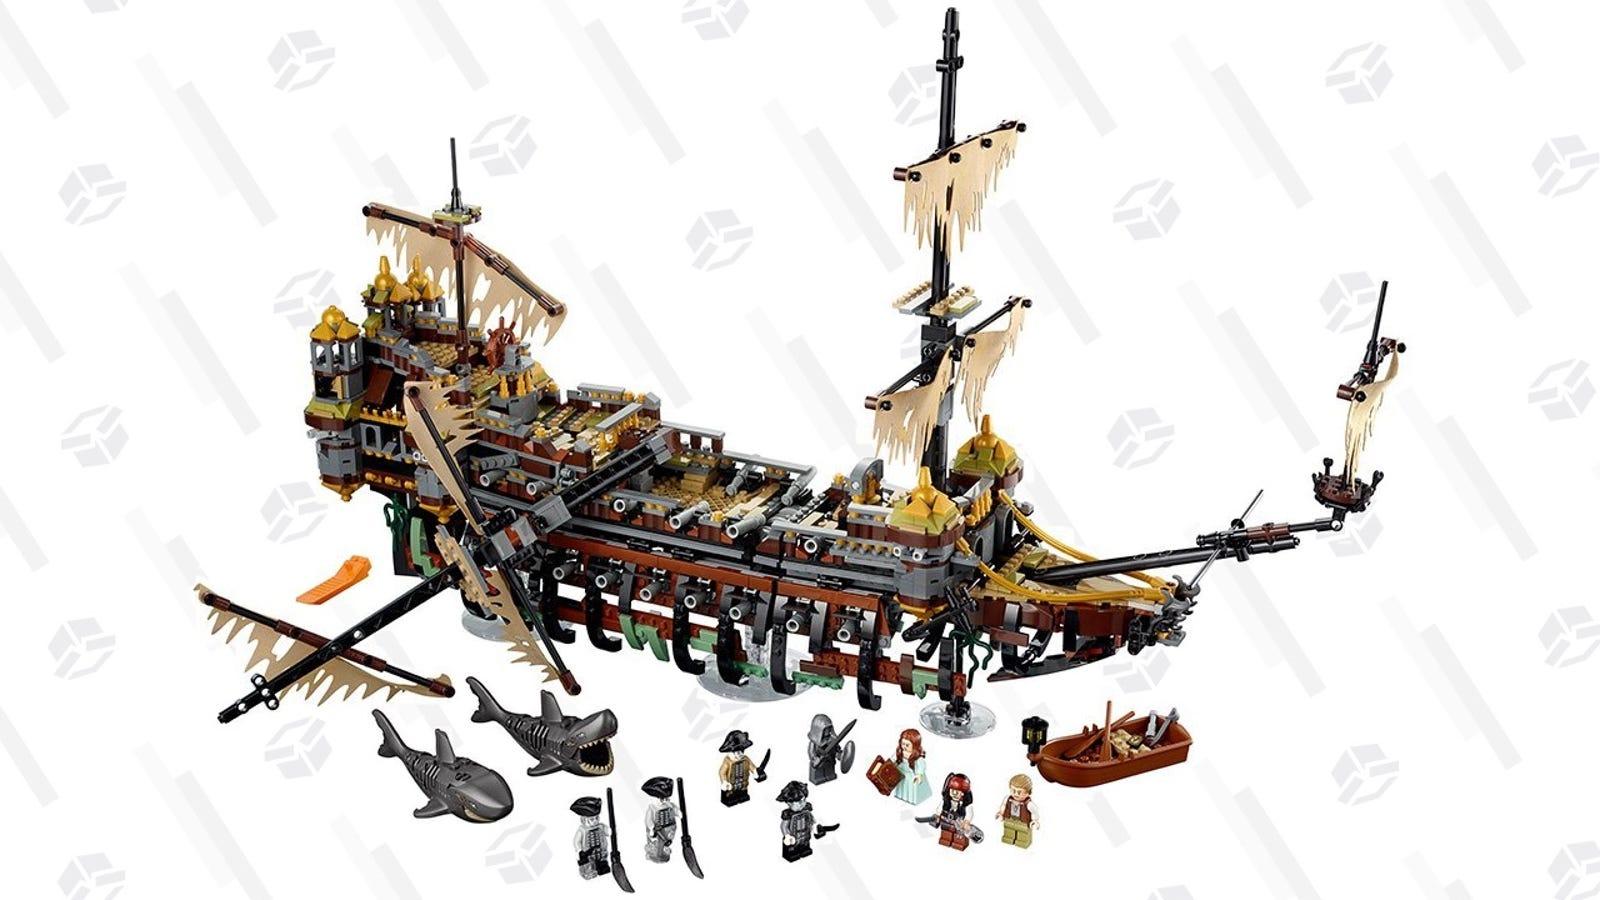 8e78e4e3b2 LEGO s Pirates of the Caribbean Silent Mary kit includes nearly 2300  pieces